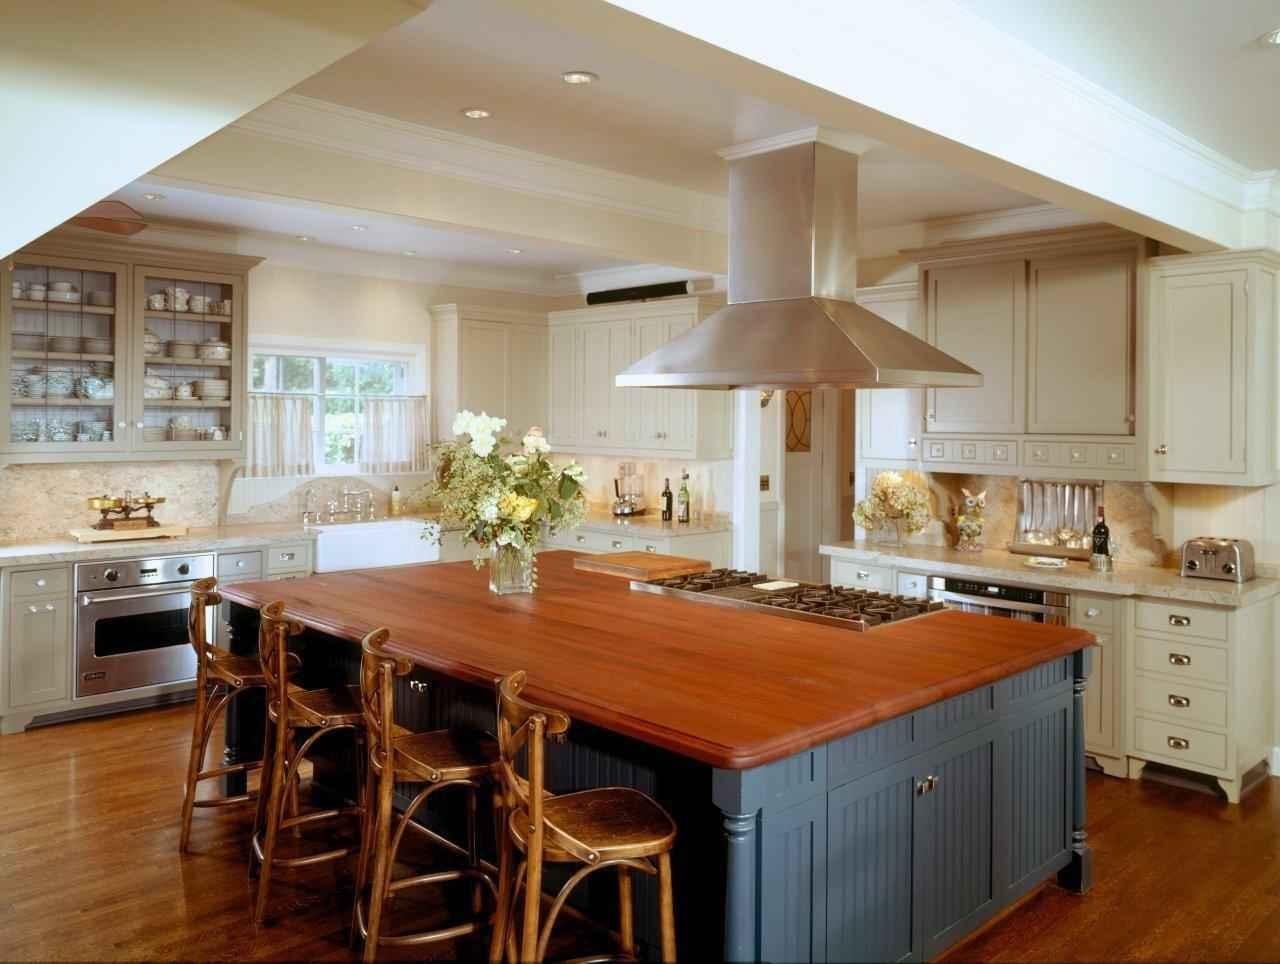 Cheap Decoration Countertop Ideas for Kitchen